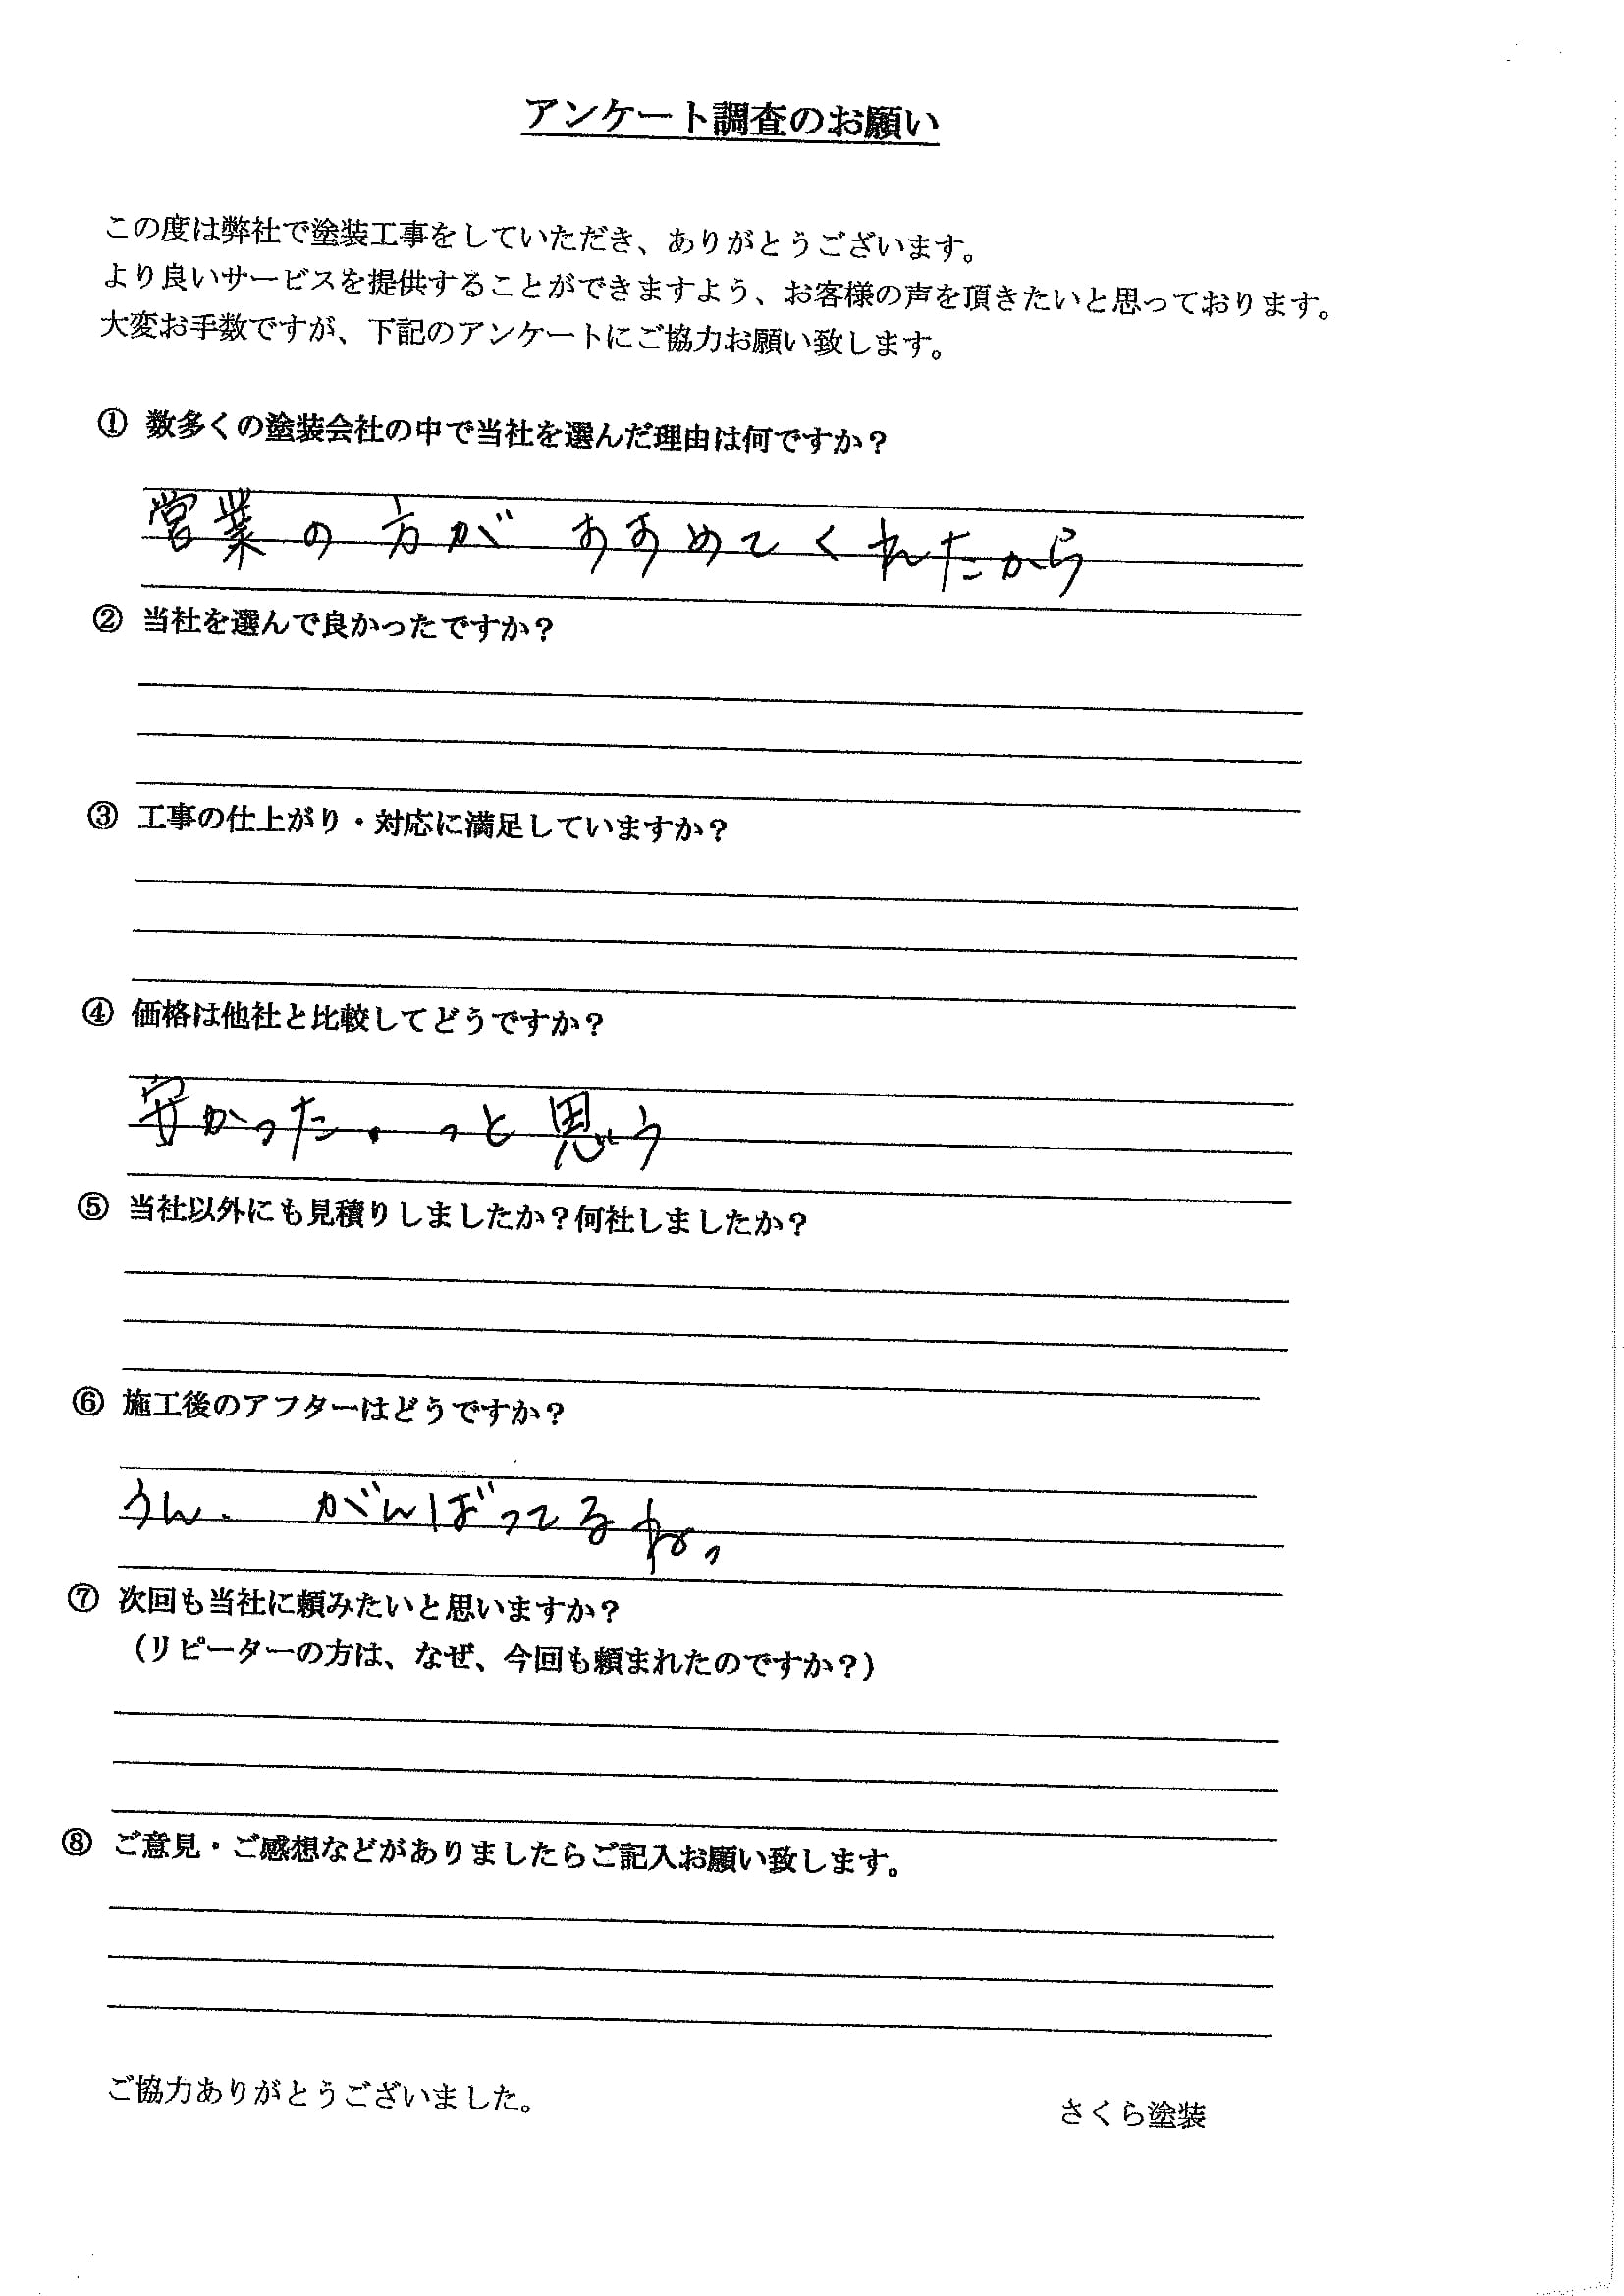 さくら塗装 埼玉県越谷市_U様_外壁屋根塗装工事_評価